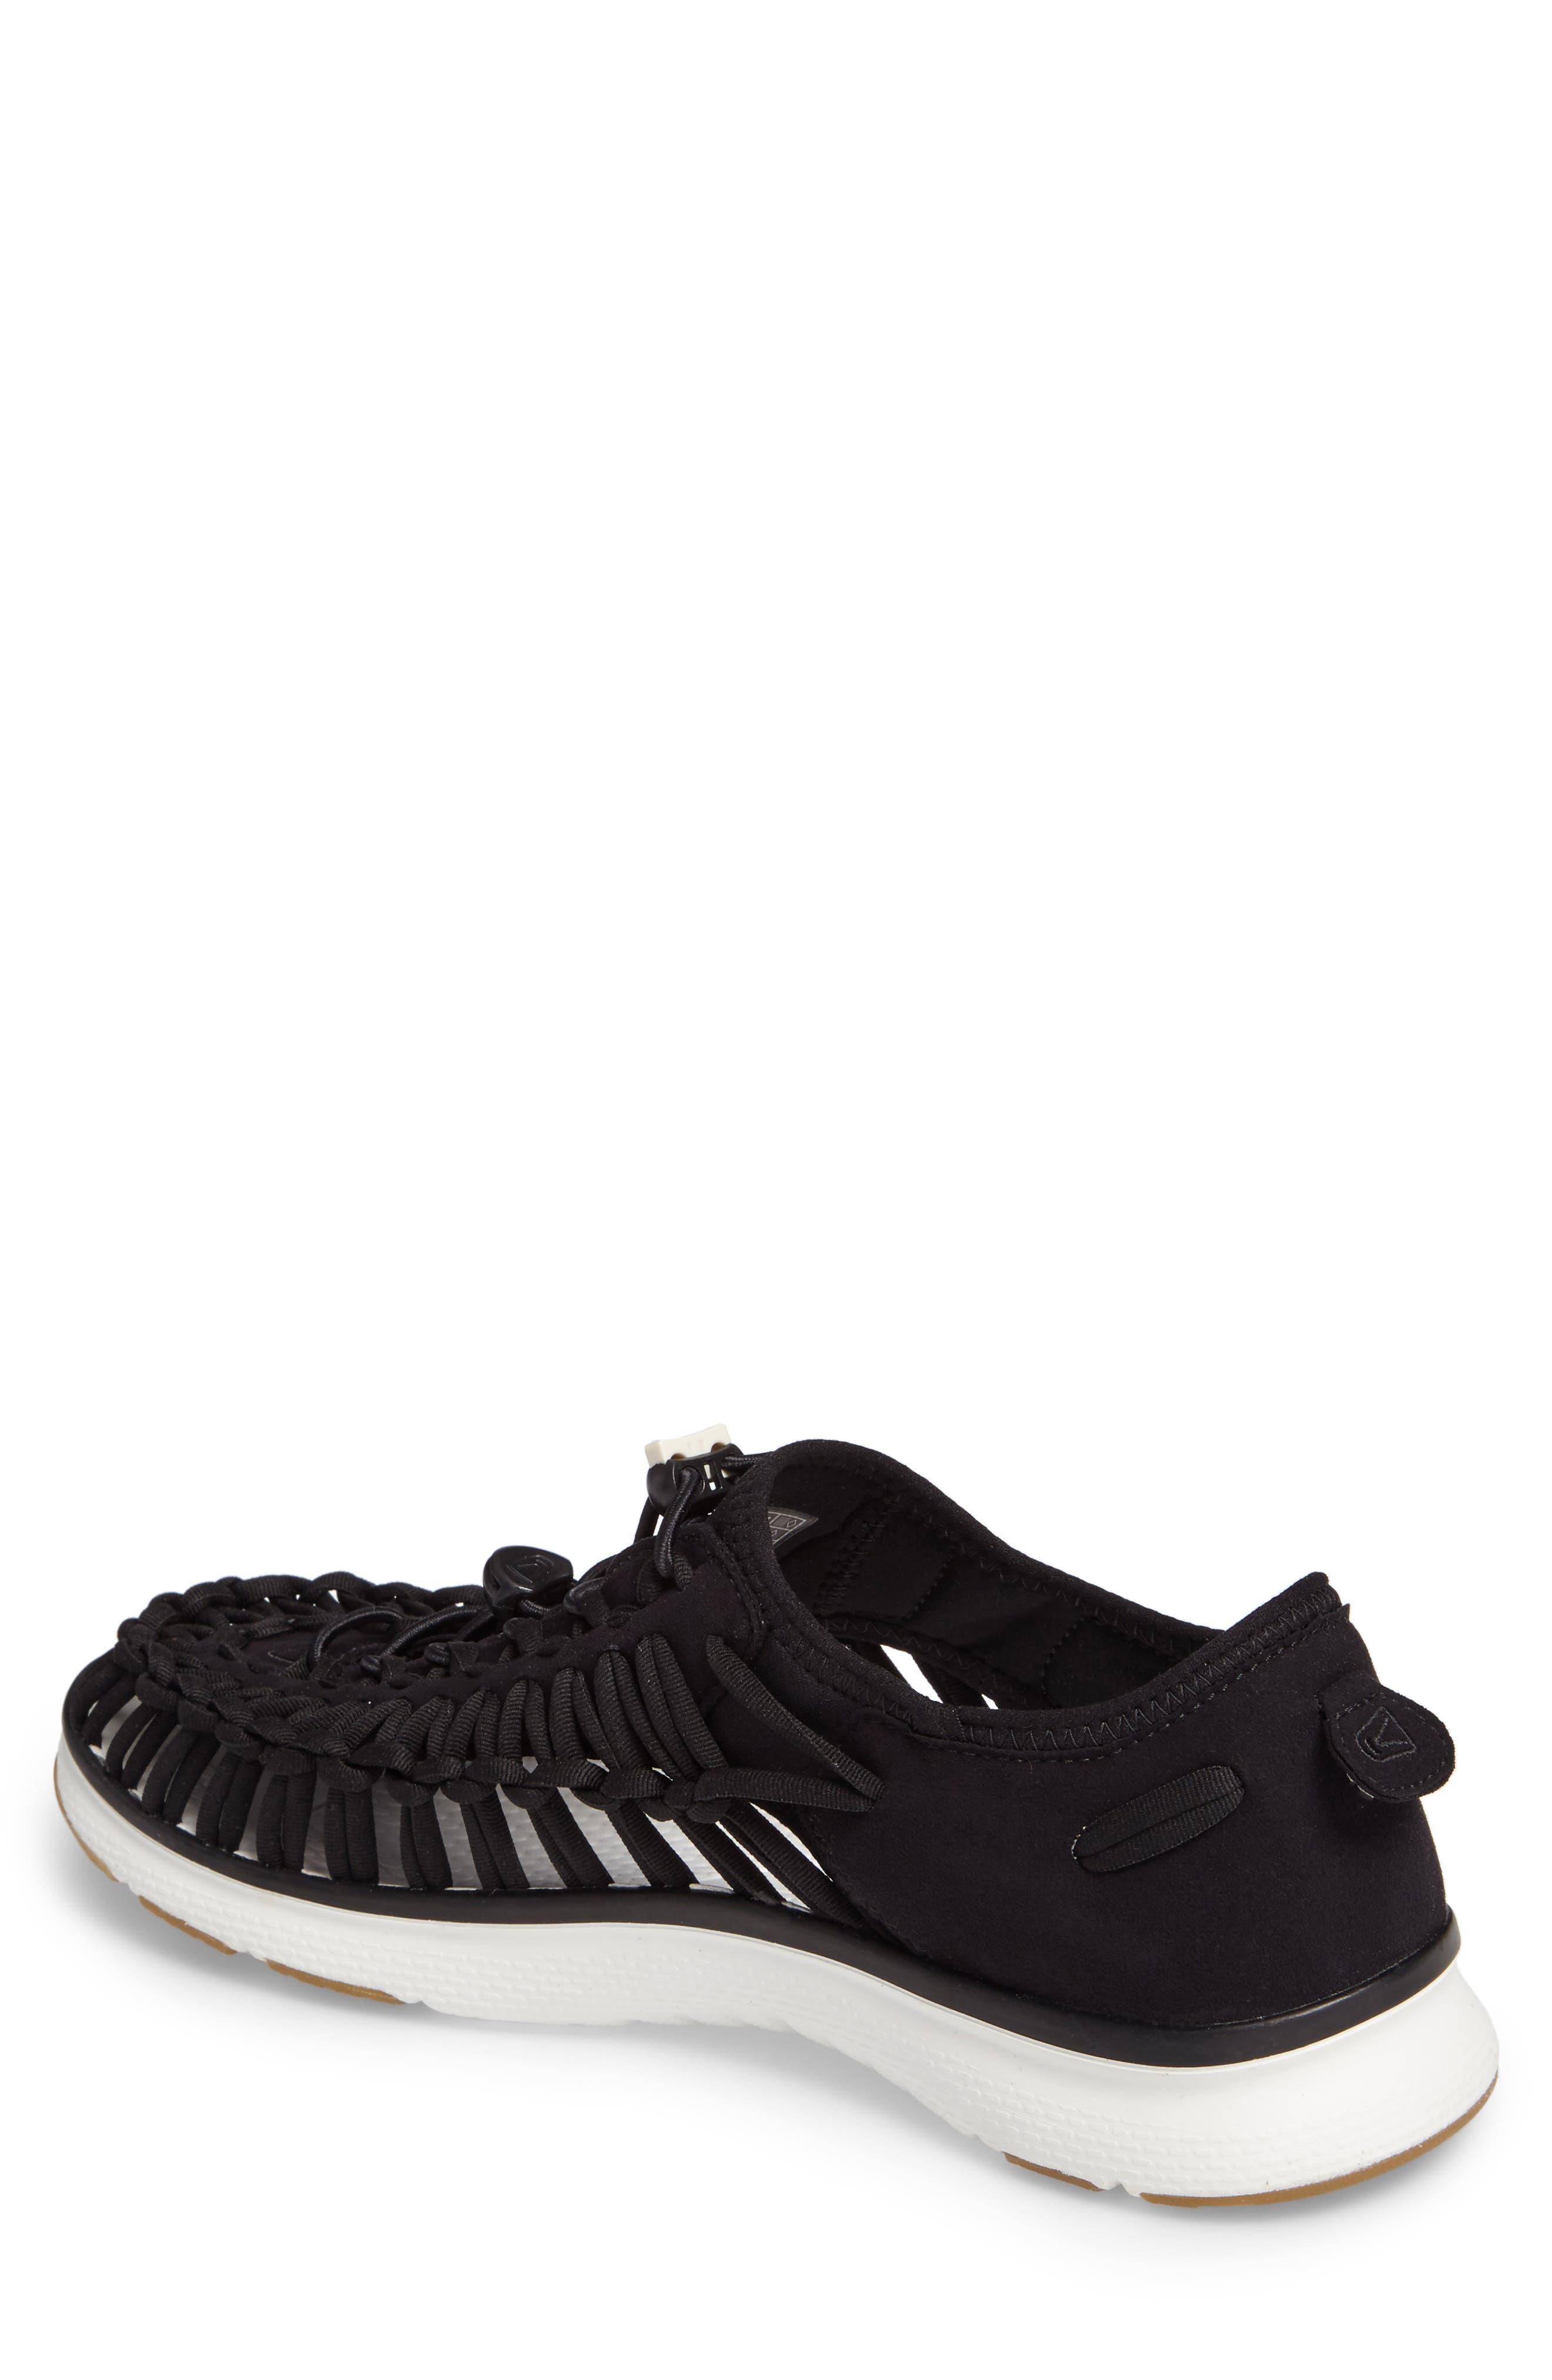 Uneek O2 Water Sneaker,                             Alternate thumbnail 2, color,                             001